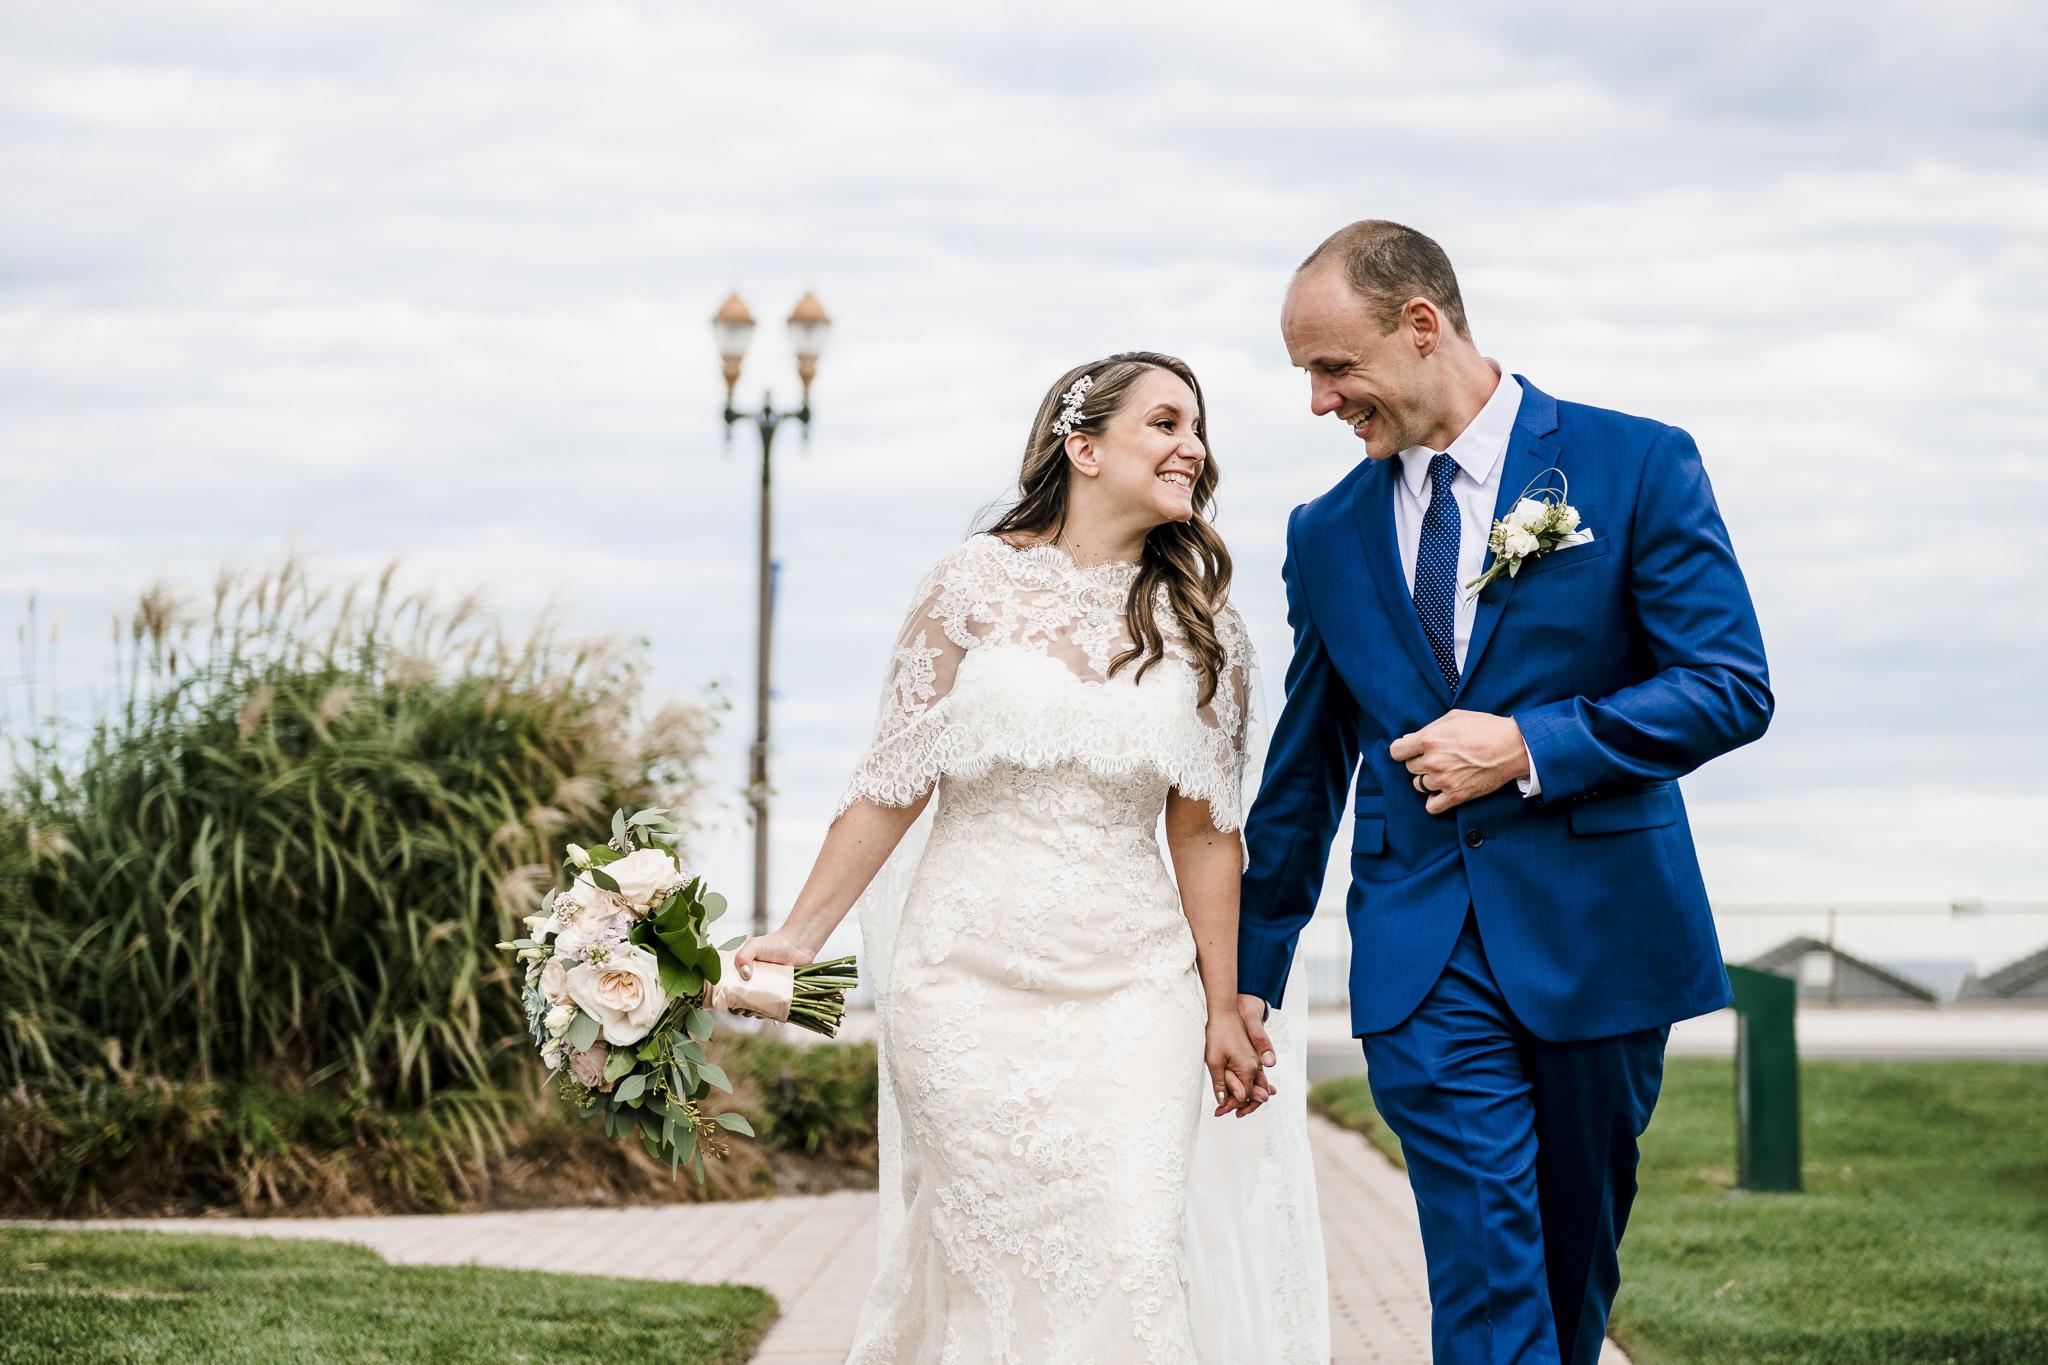 Culos-Sheraton-Eatontown-Long-Branch-Wedding-Photographer-21.JPG